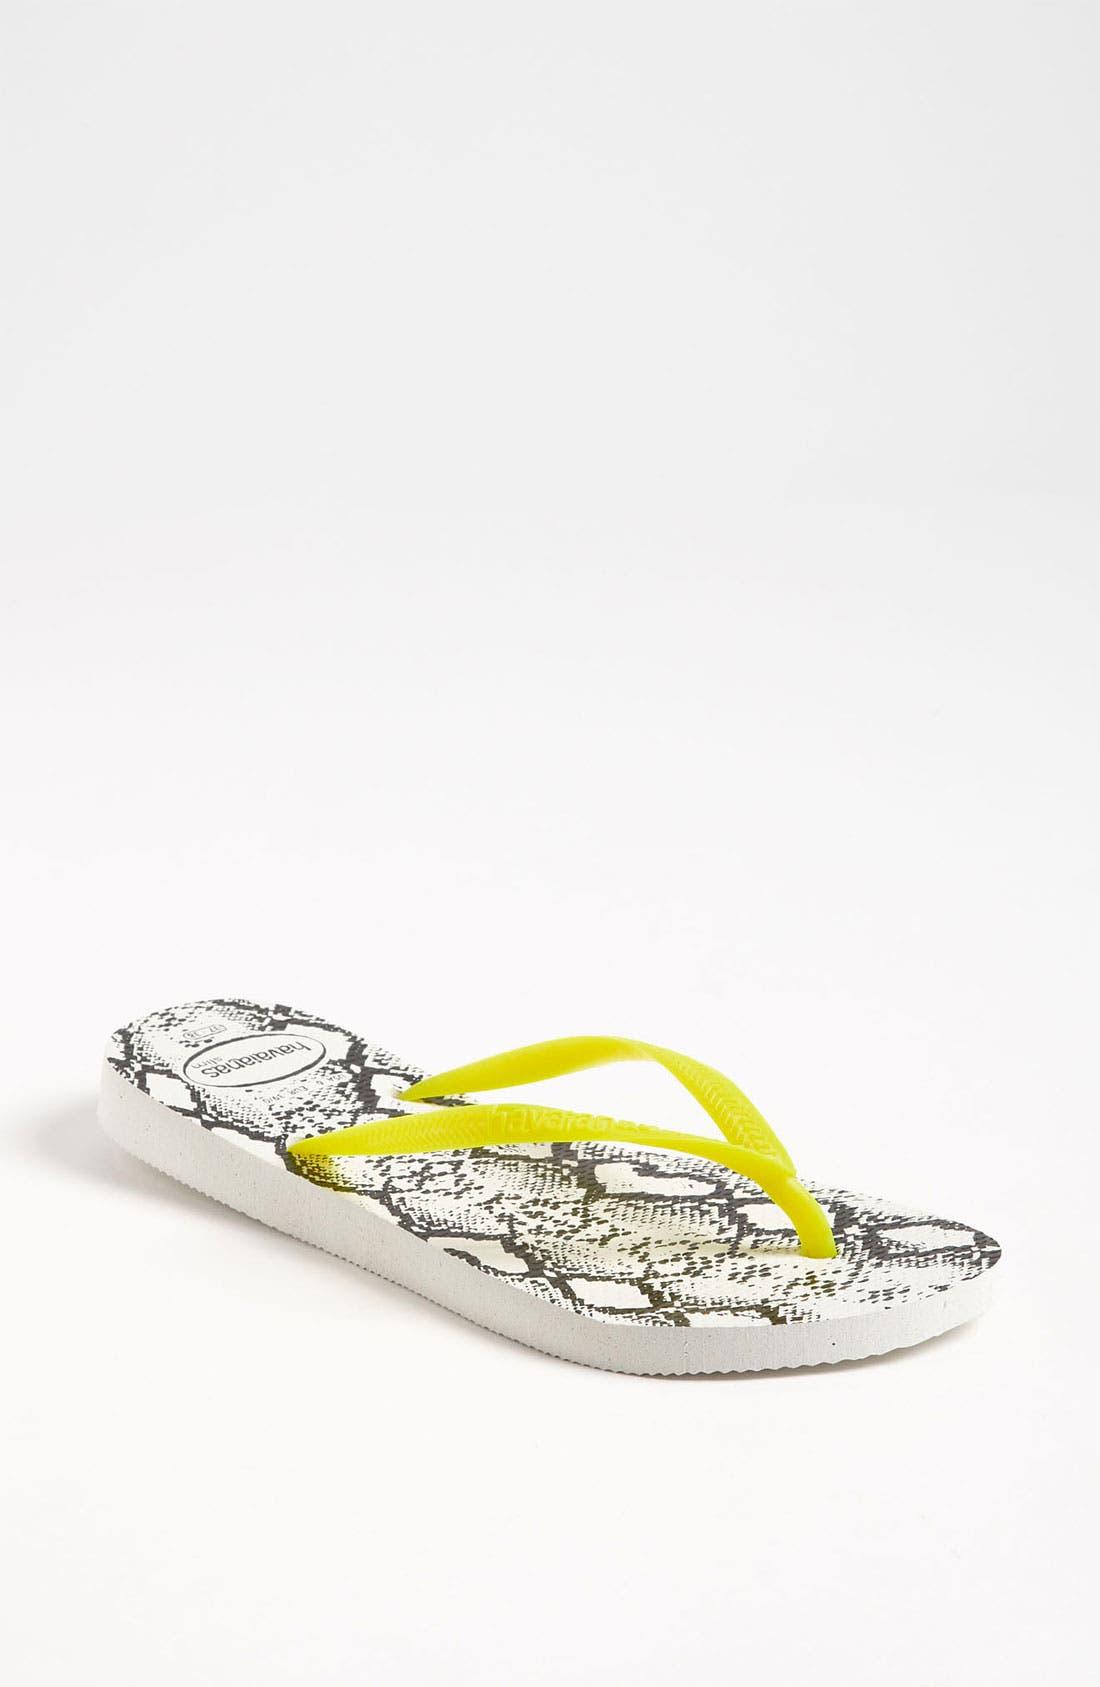 Main Image - Havaianas 'Slim Fluorescent Animal' Sandal (Women)